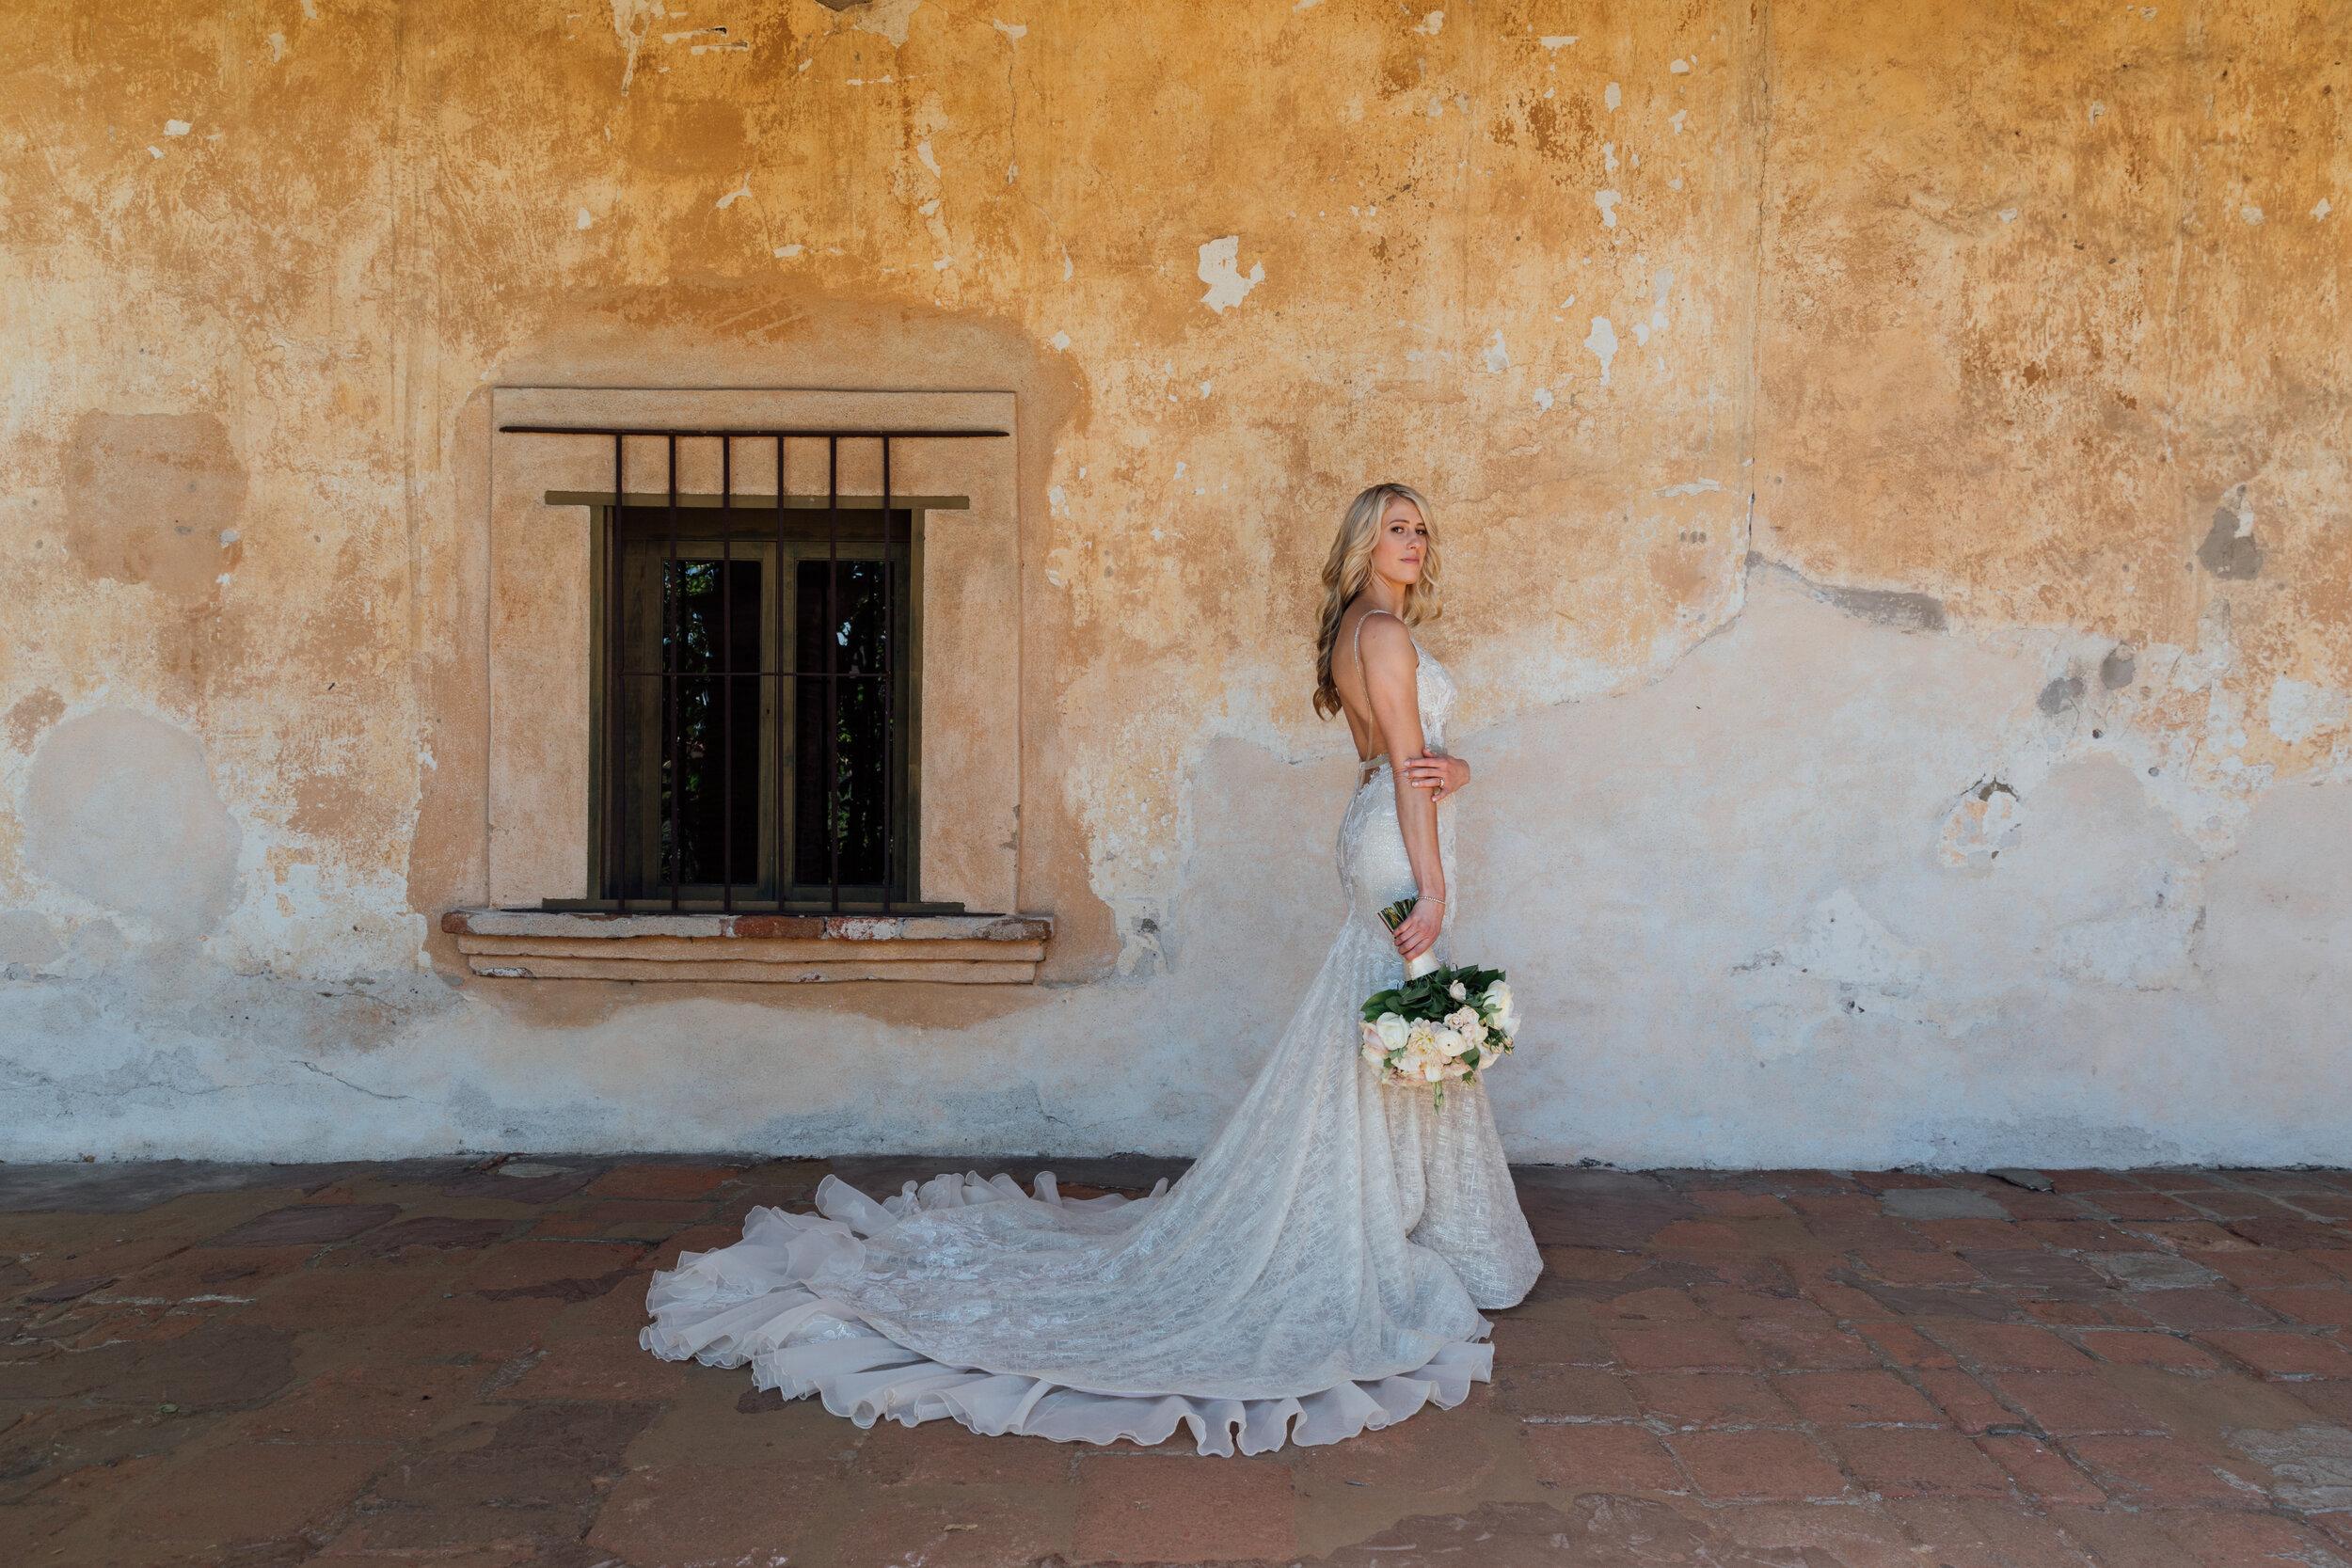 Lucia_Wedding_photocred_leiavita-27.jpg